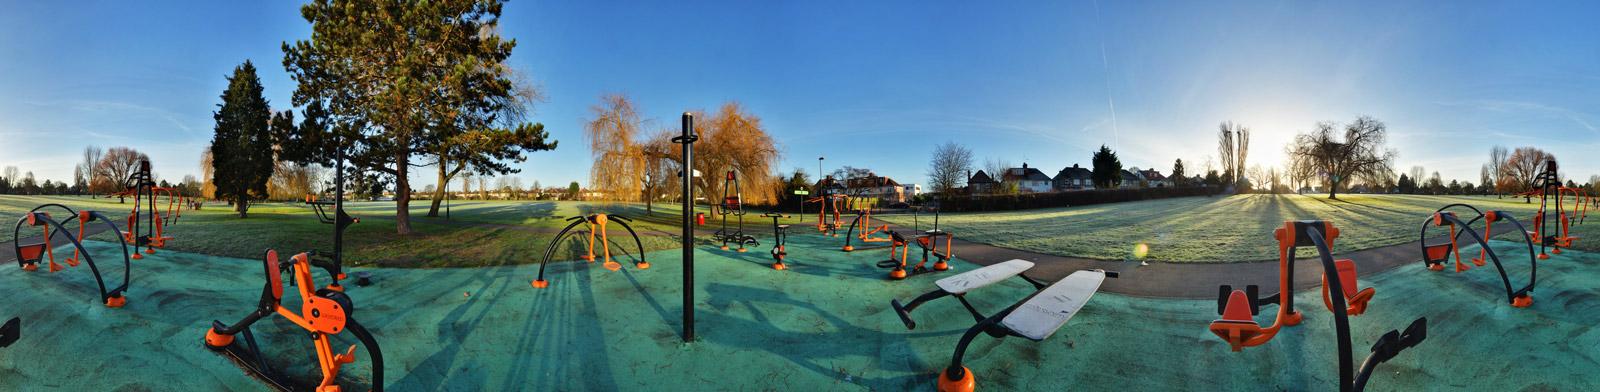 20161227_brent_preston_park-exercise-area